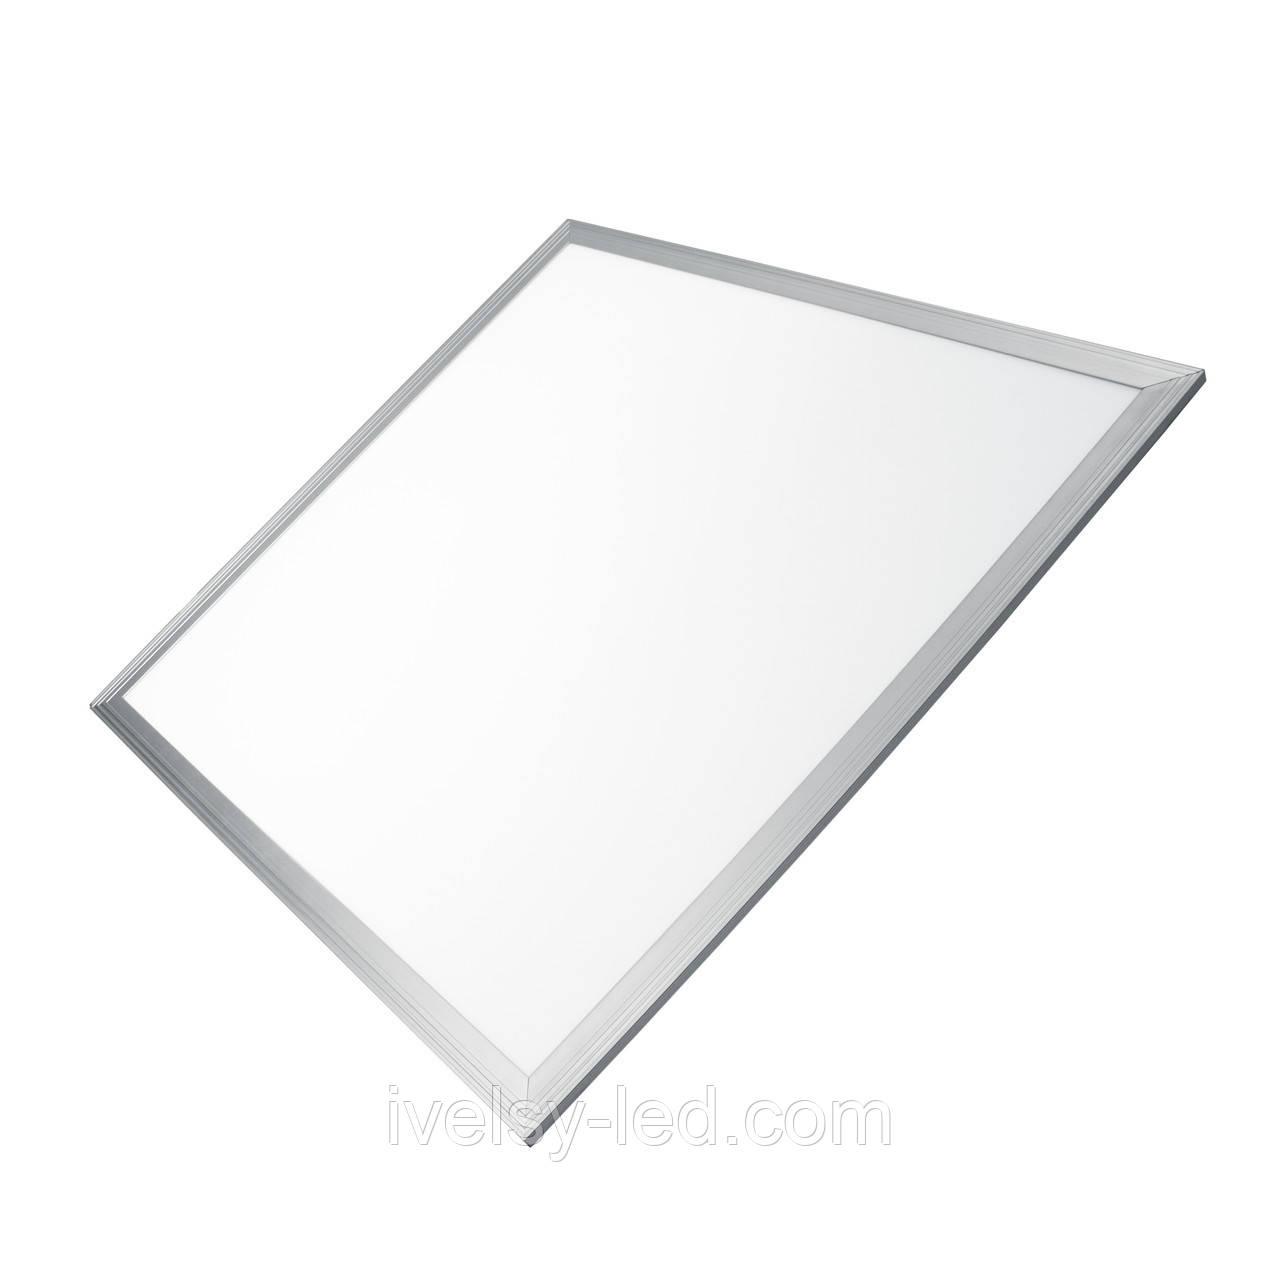 LED Светильник EUROLAMP 60х60 (панель) 36W 4100K